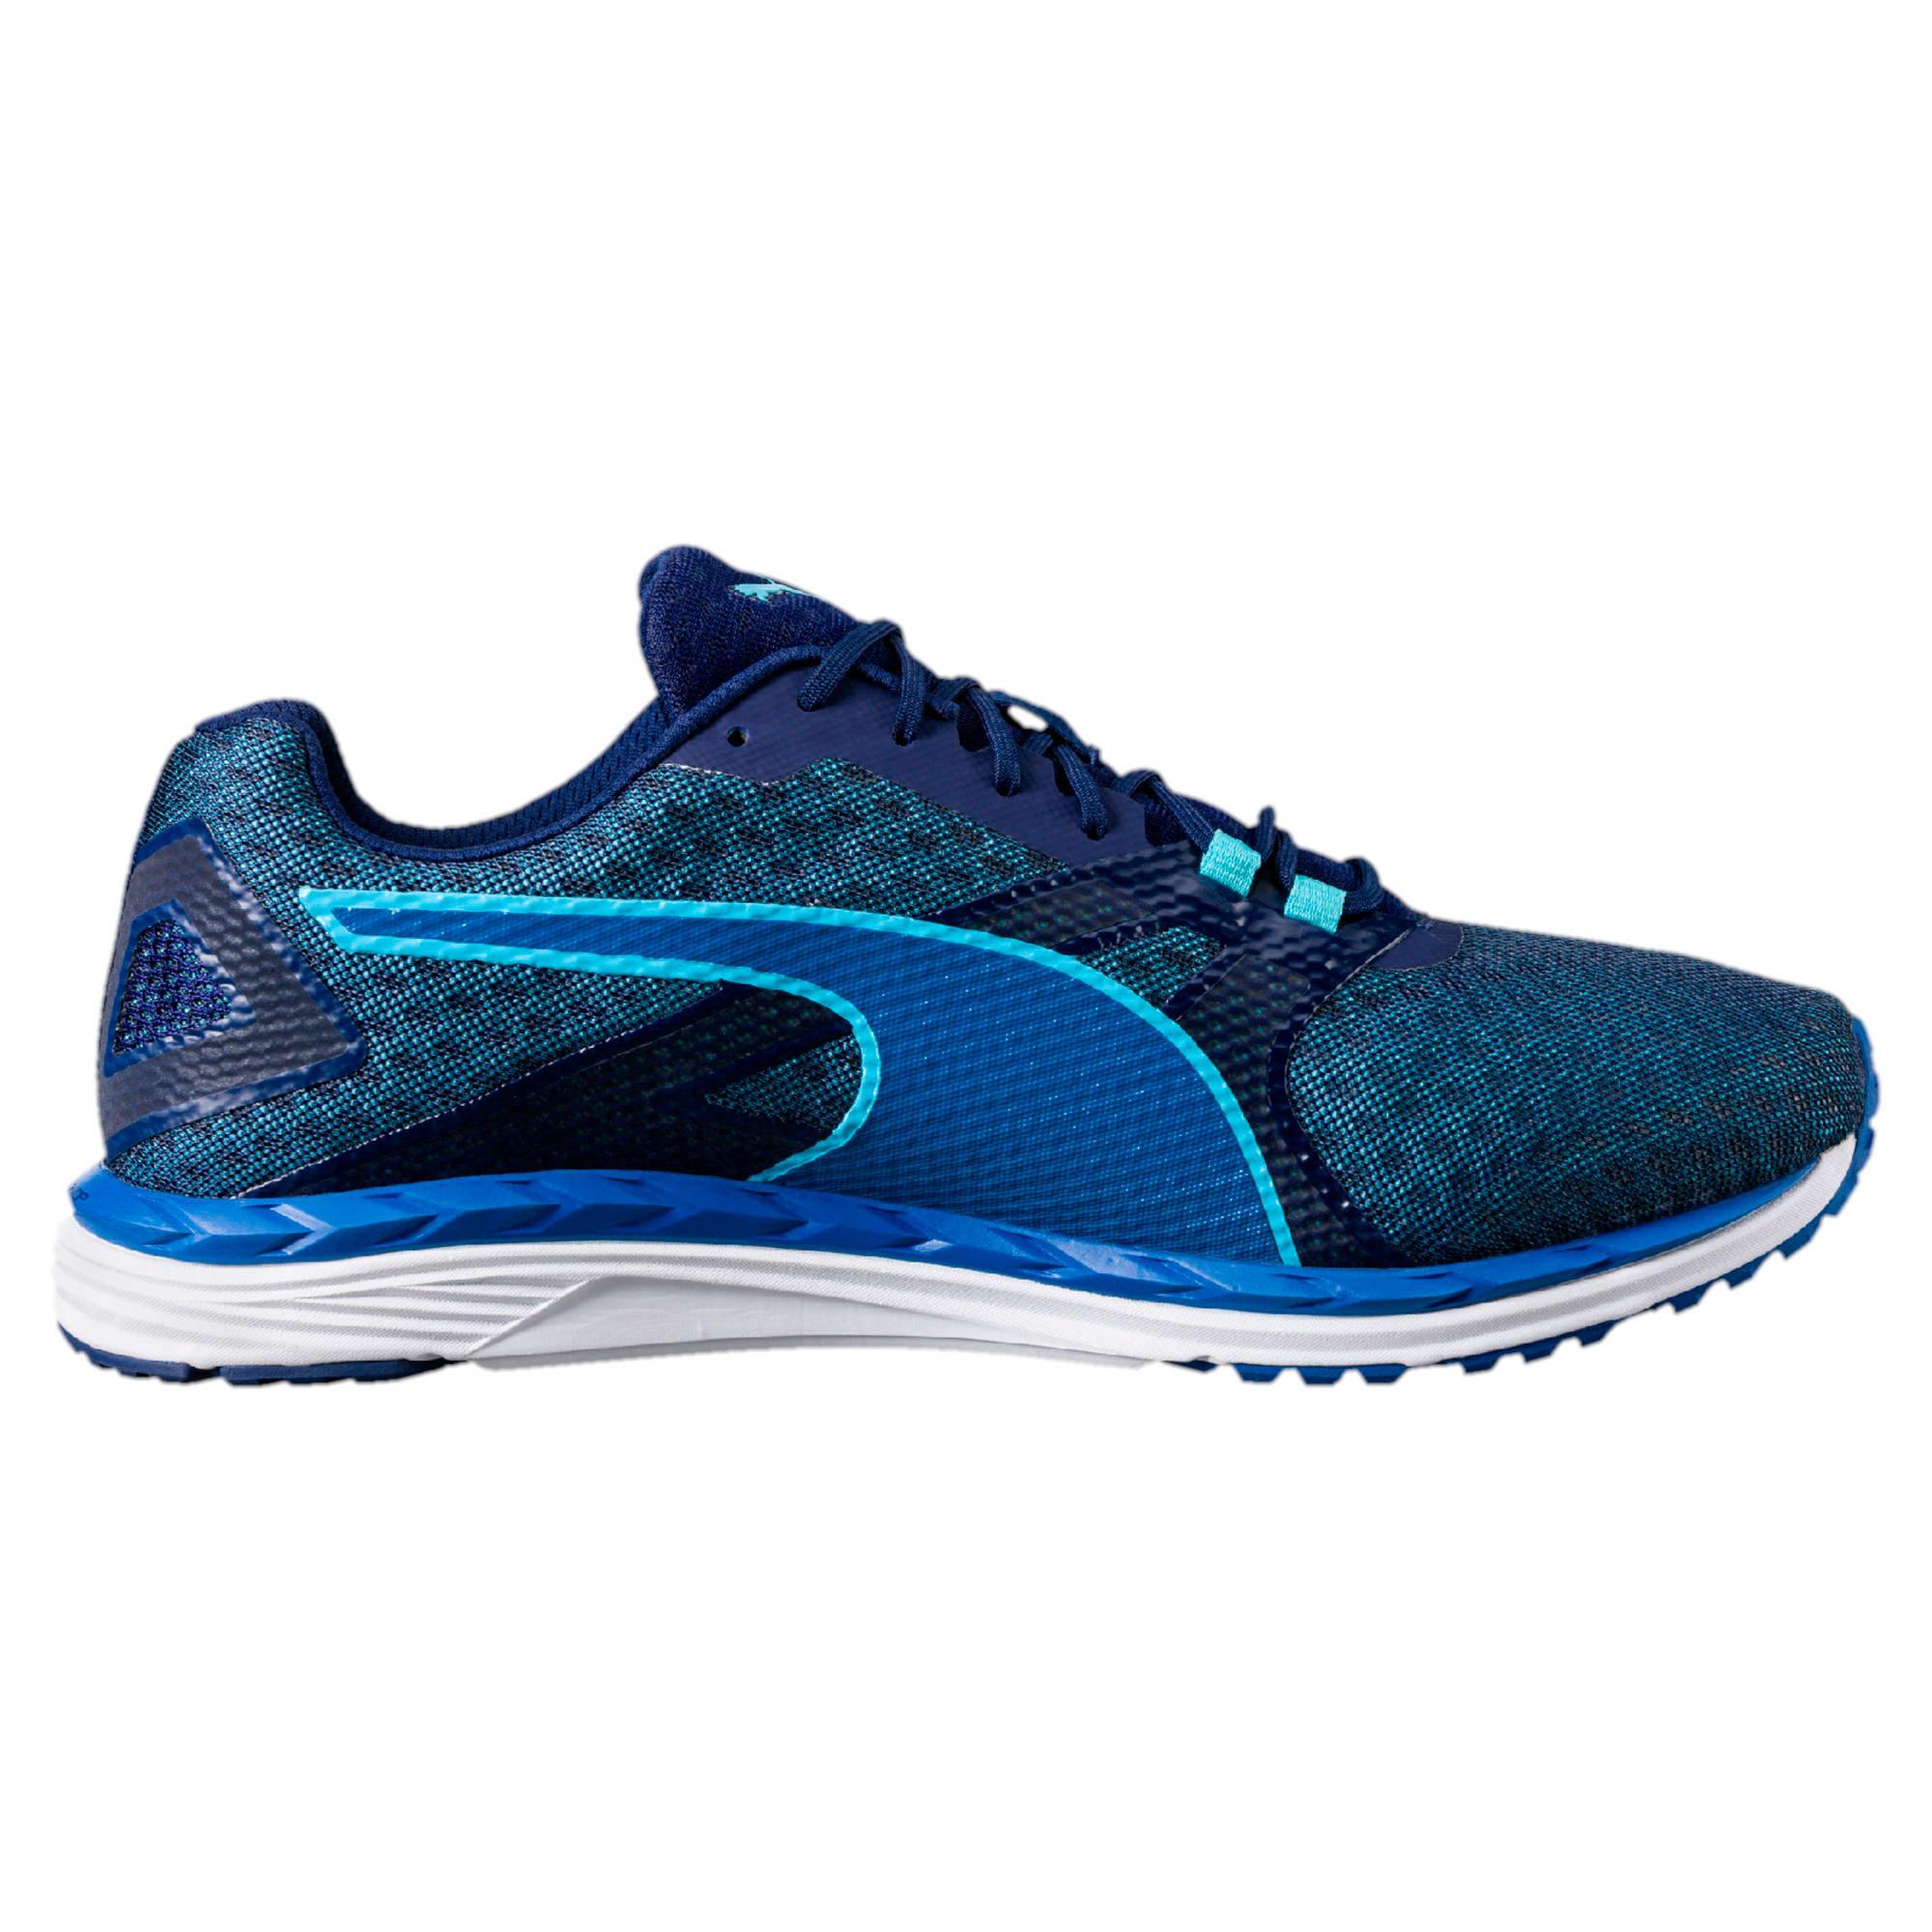 Thumbnail 5 of Speed 300 IGNITE 2 Men's Running Shoes, LapisBlue-BlueDepths-Turq, medium-IND